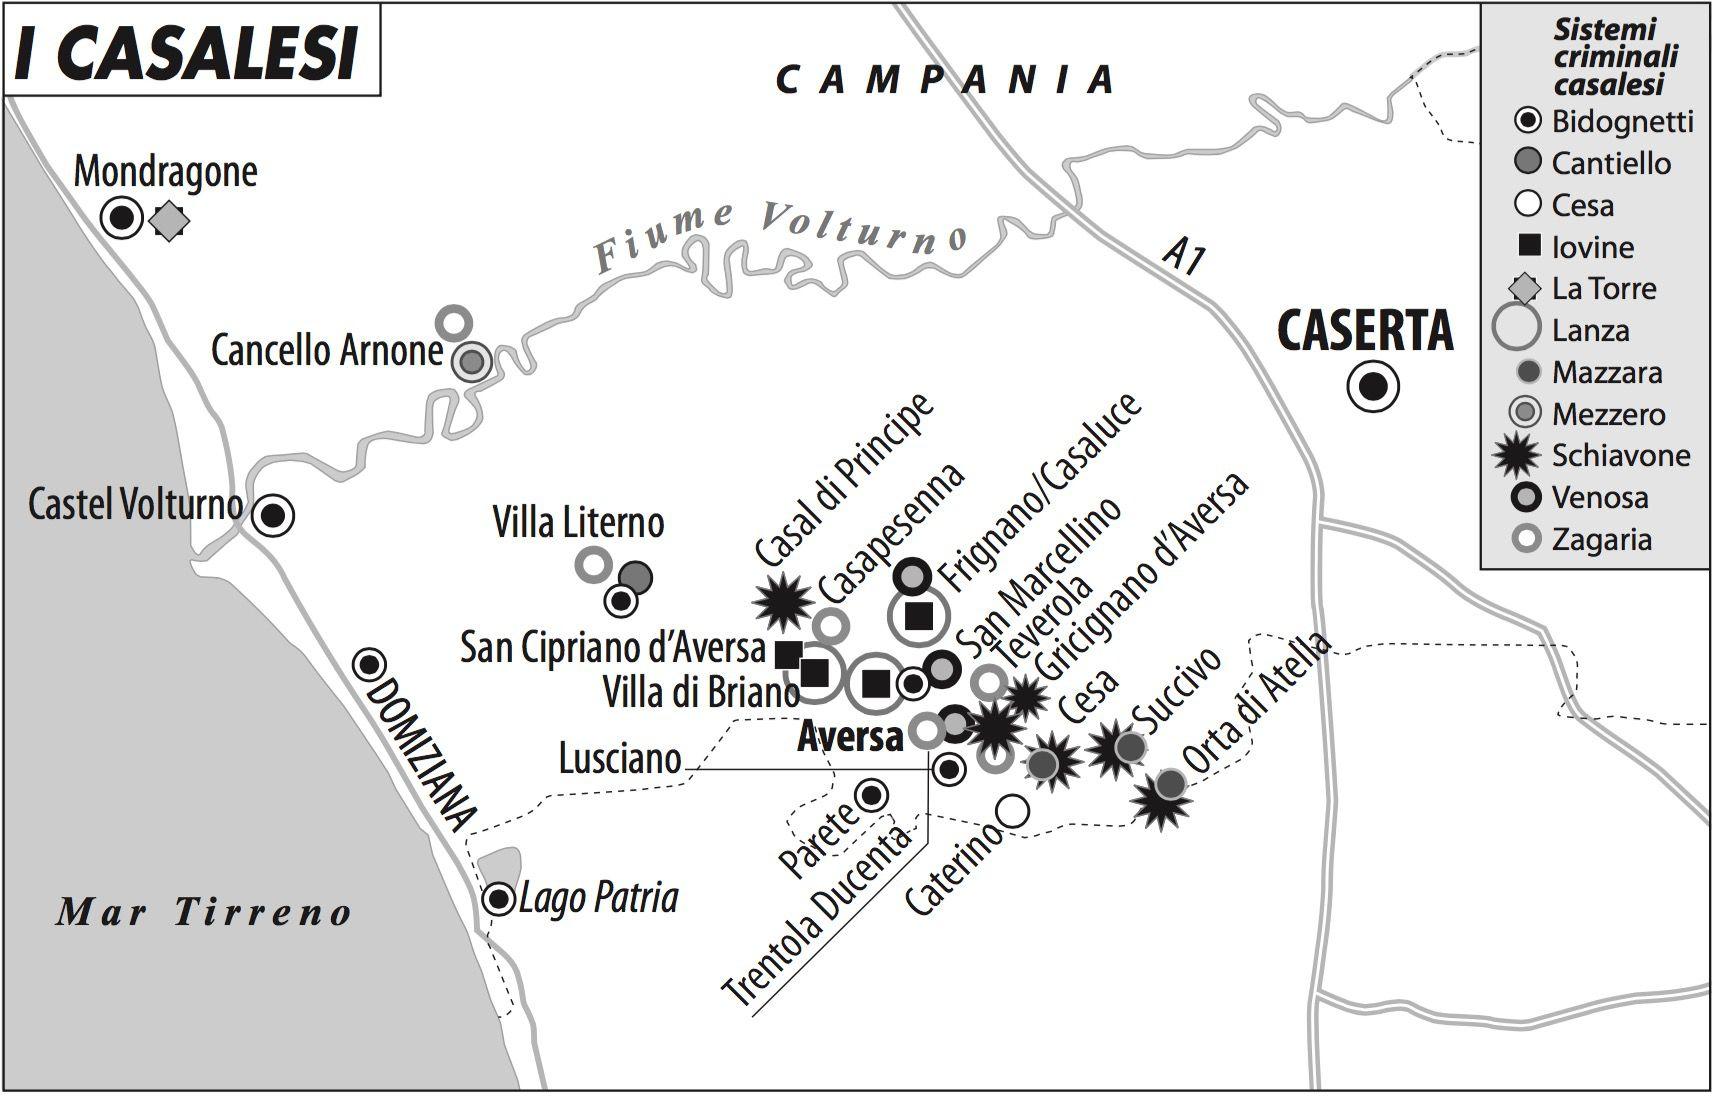 Casalesi